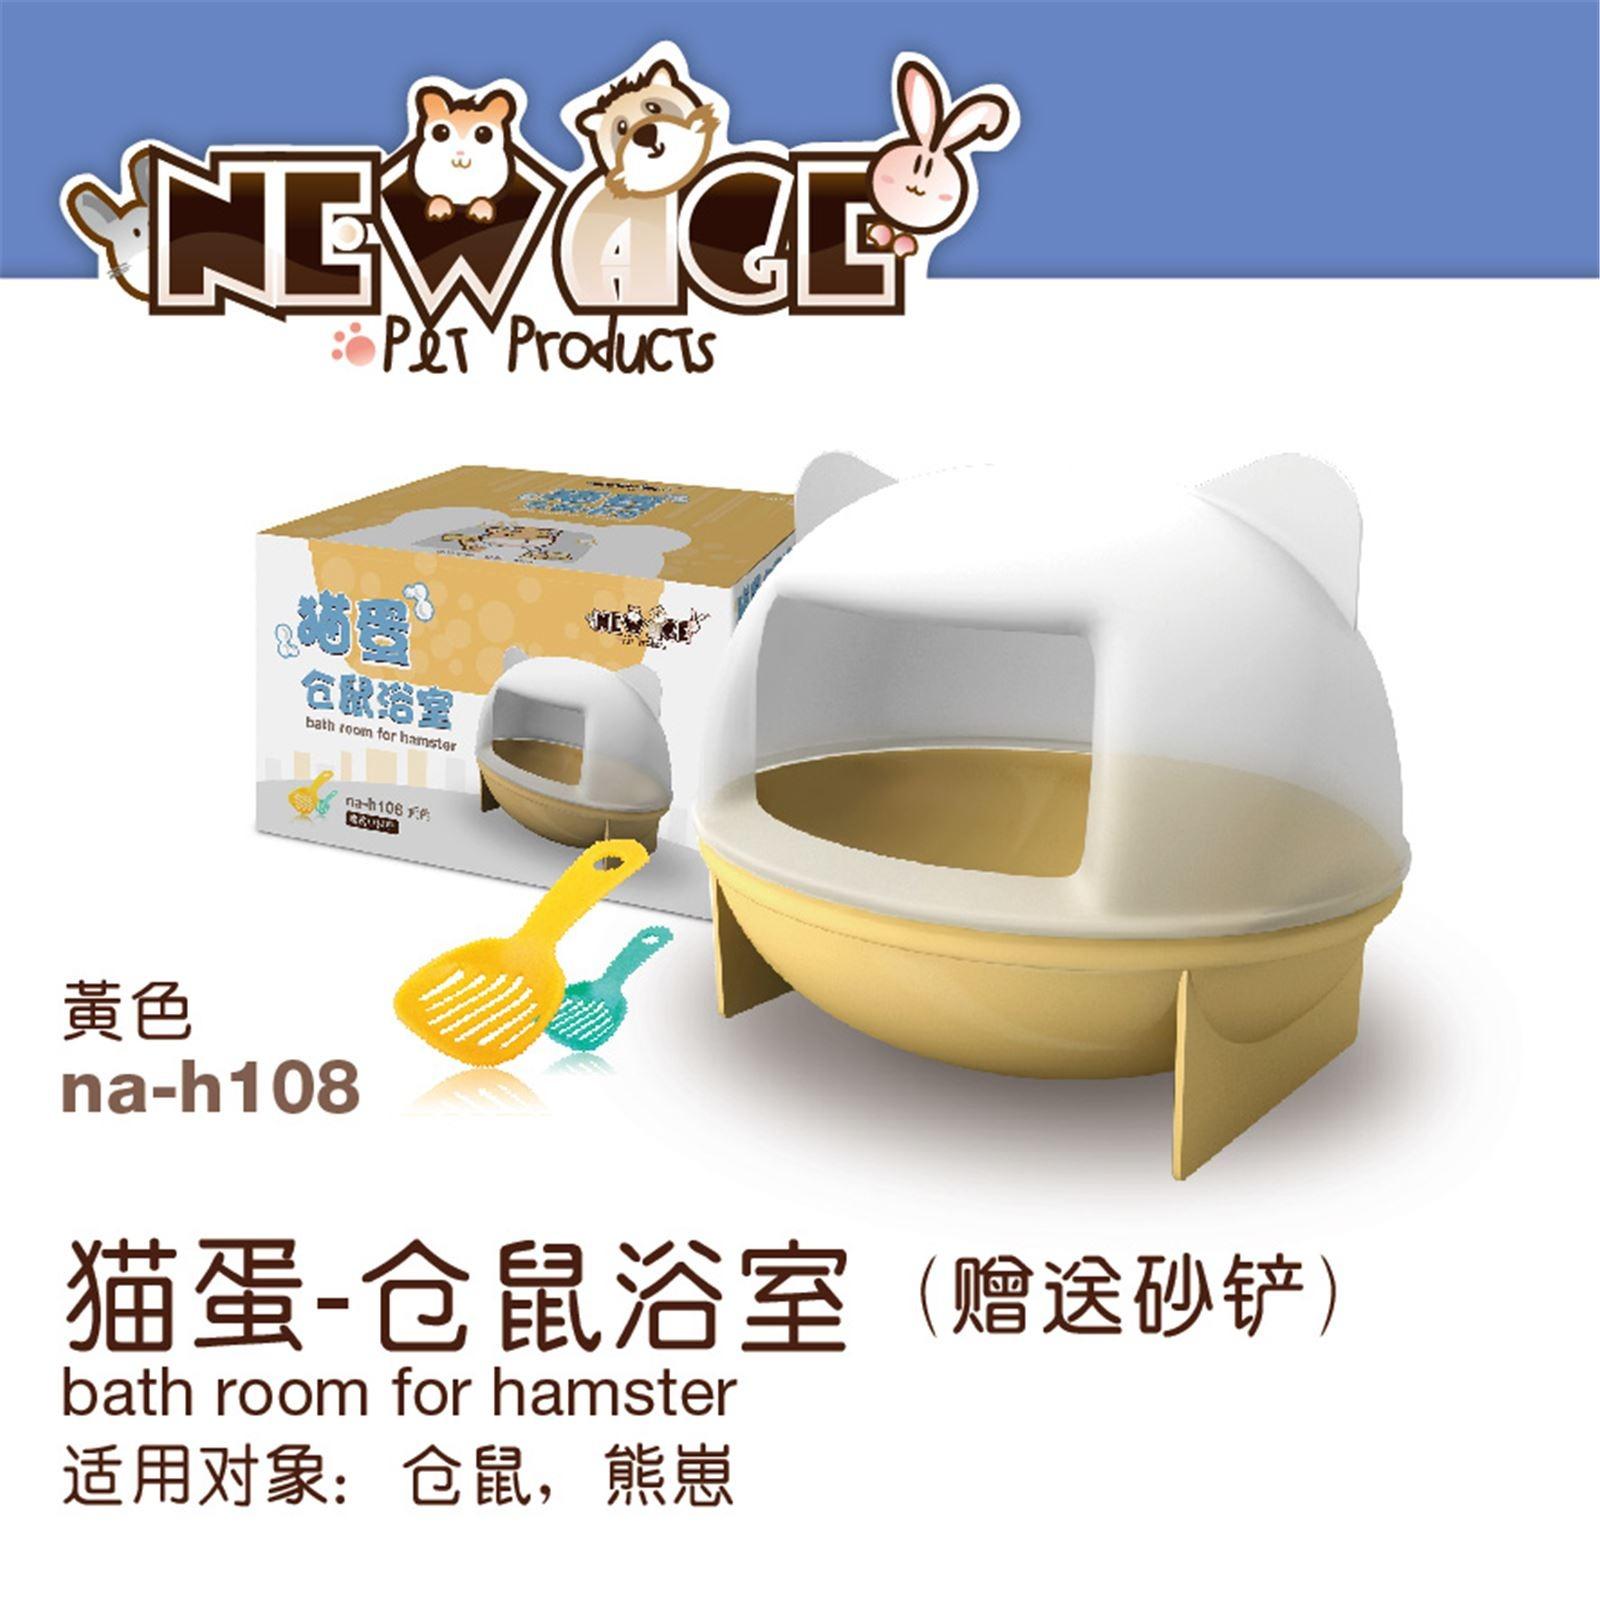 Edai New Age Hamster Kitty Bathroom Yellow